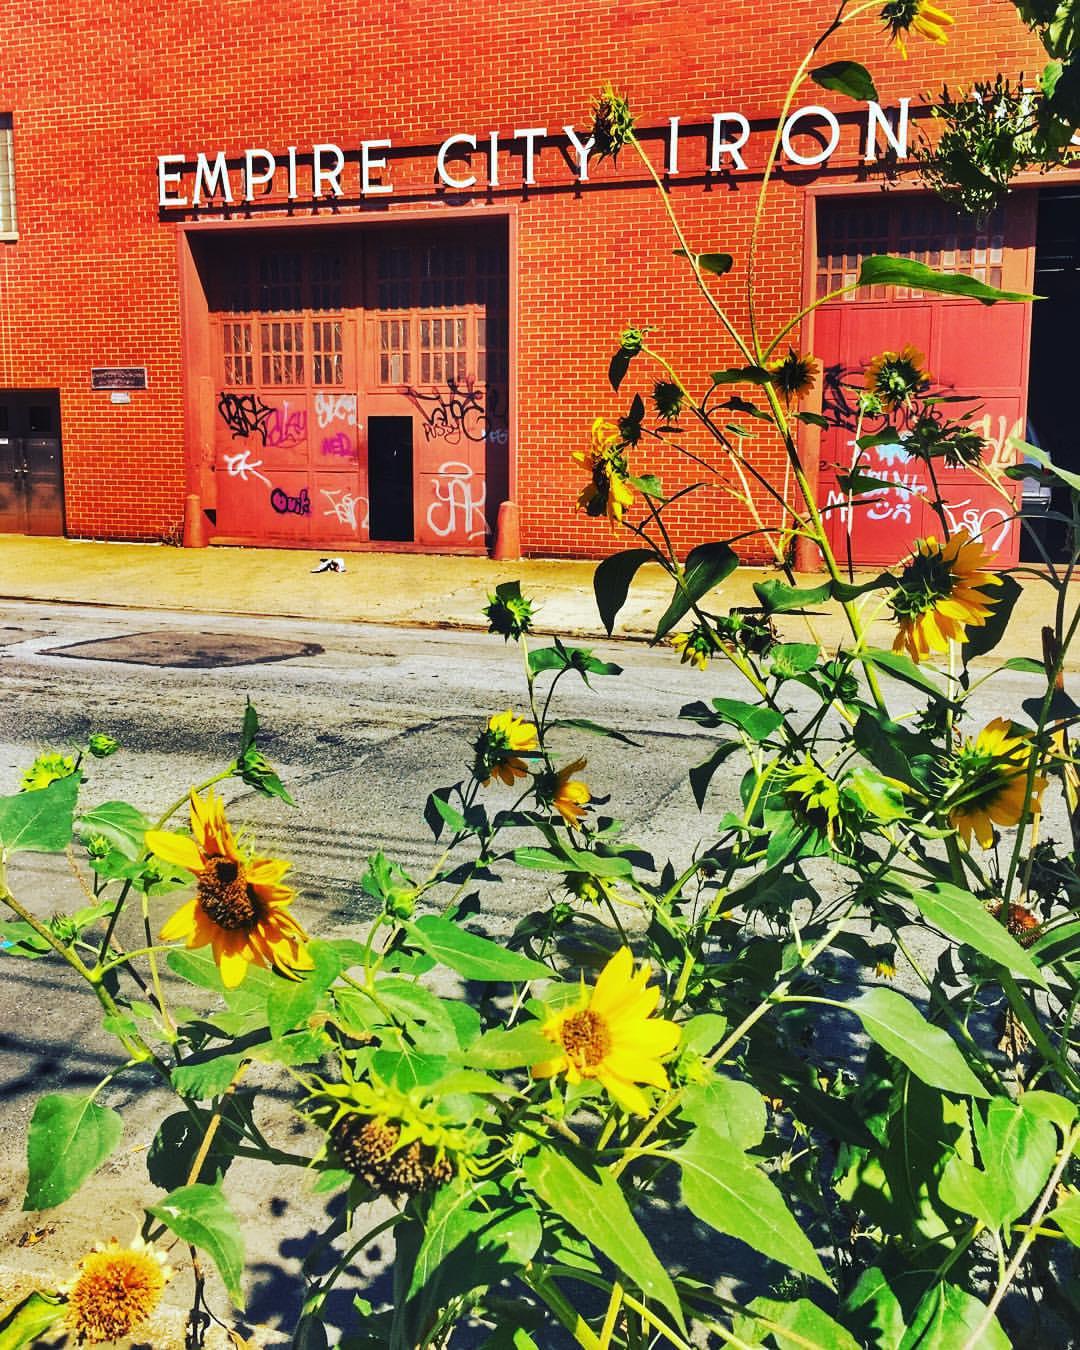 Est 1904 🌻        #longislandcity #lic #empirecityironworks #queenscapes #itsinqueens #queensnyc #heartofqueens (at Empire City Iron Wks)